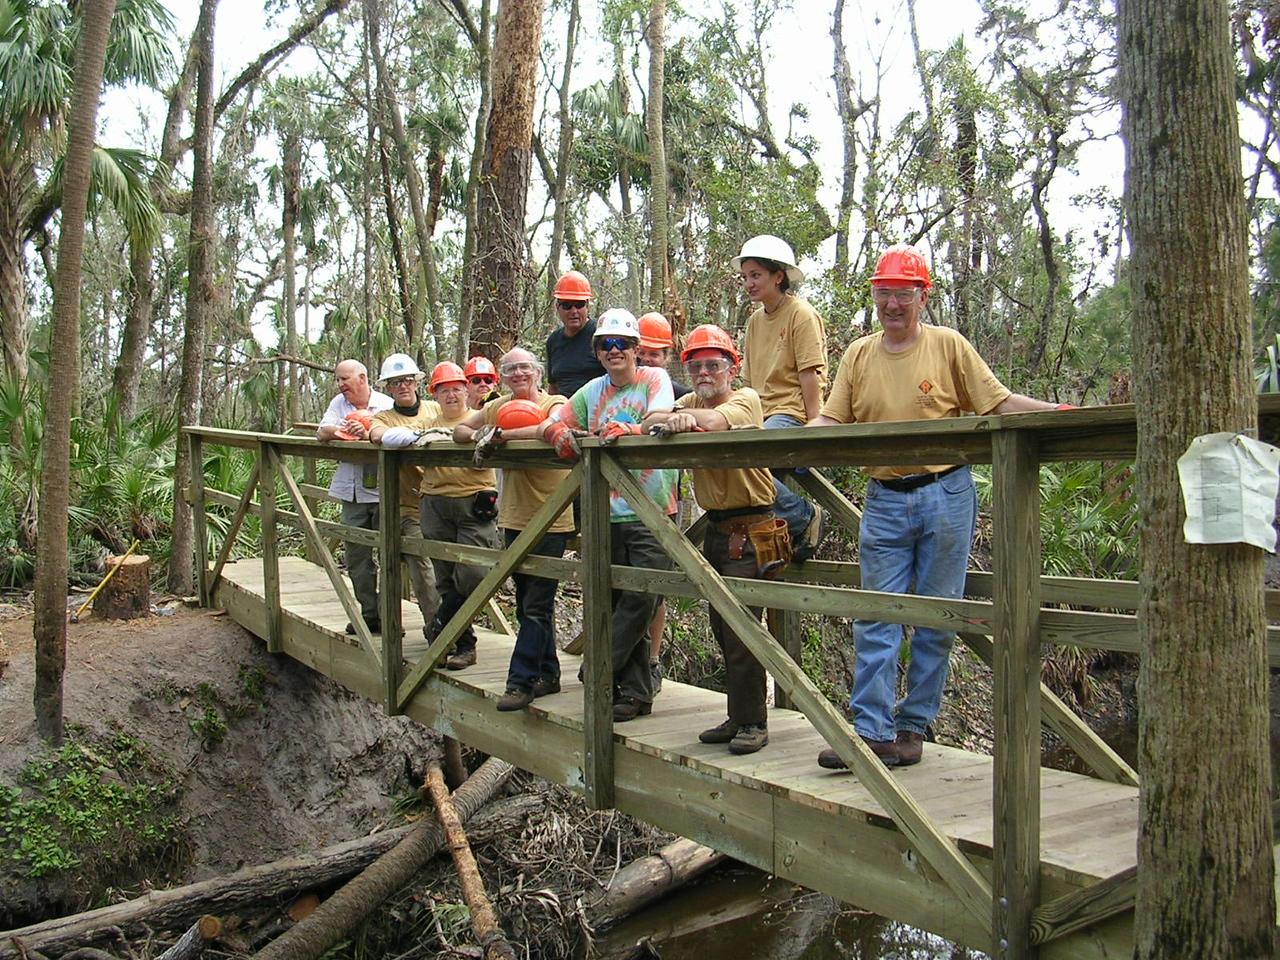 F-Troop completes their second bridge<br /> PHOTO CREDIT: Roger Werner / Florida Trail Association